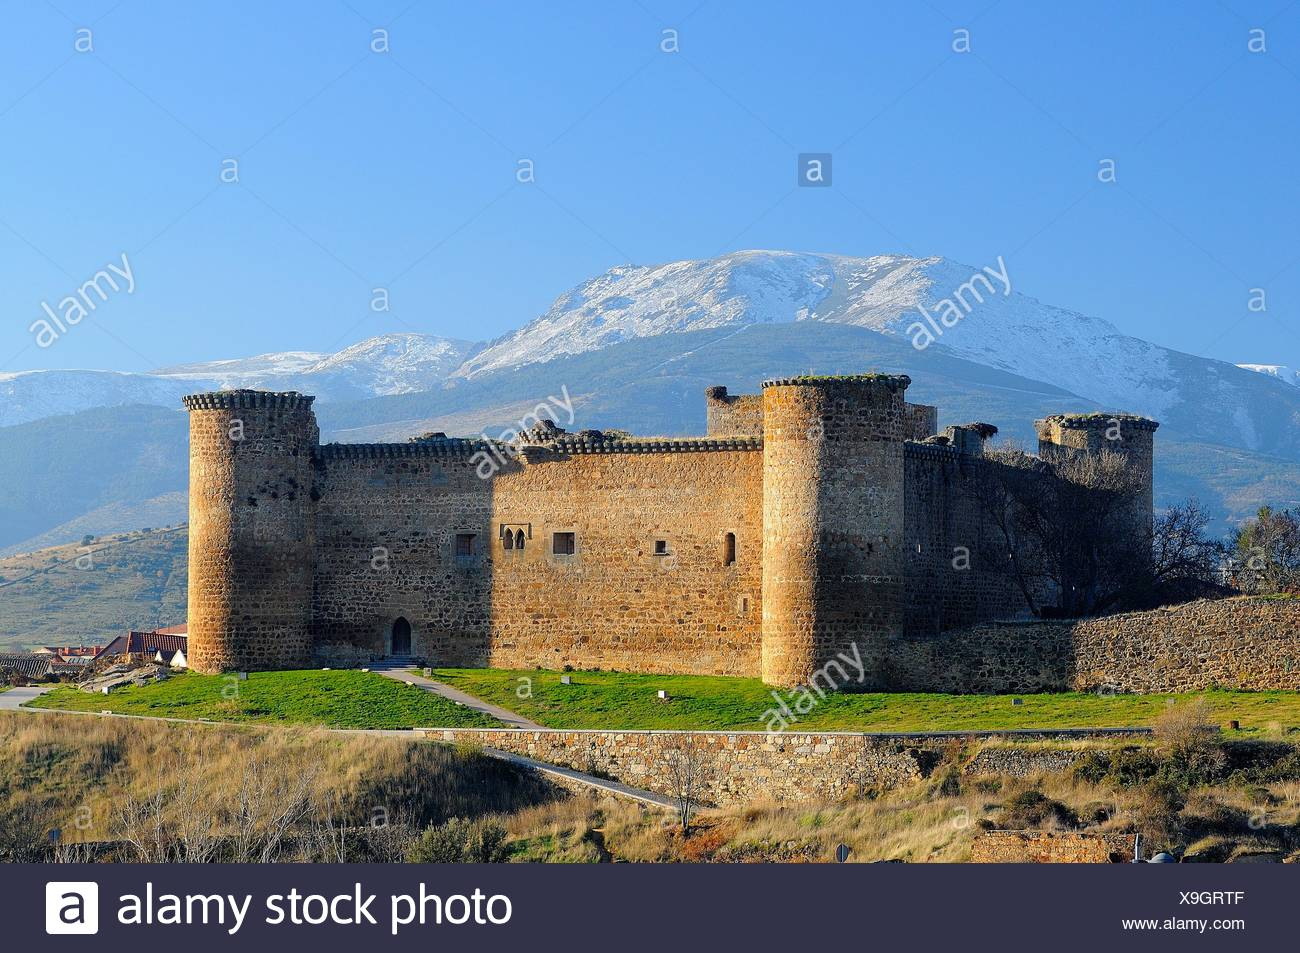 Castle of Valdecorneja.14th century.Barco de Ávila.Ávila province.Castilla y León.Spain Stock Photo